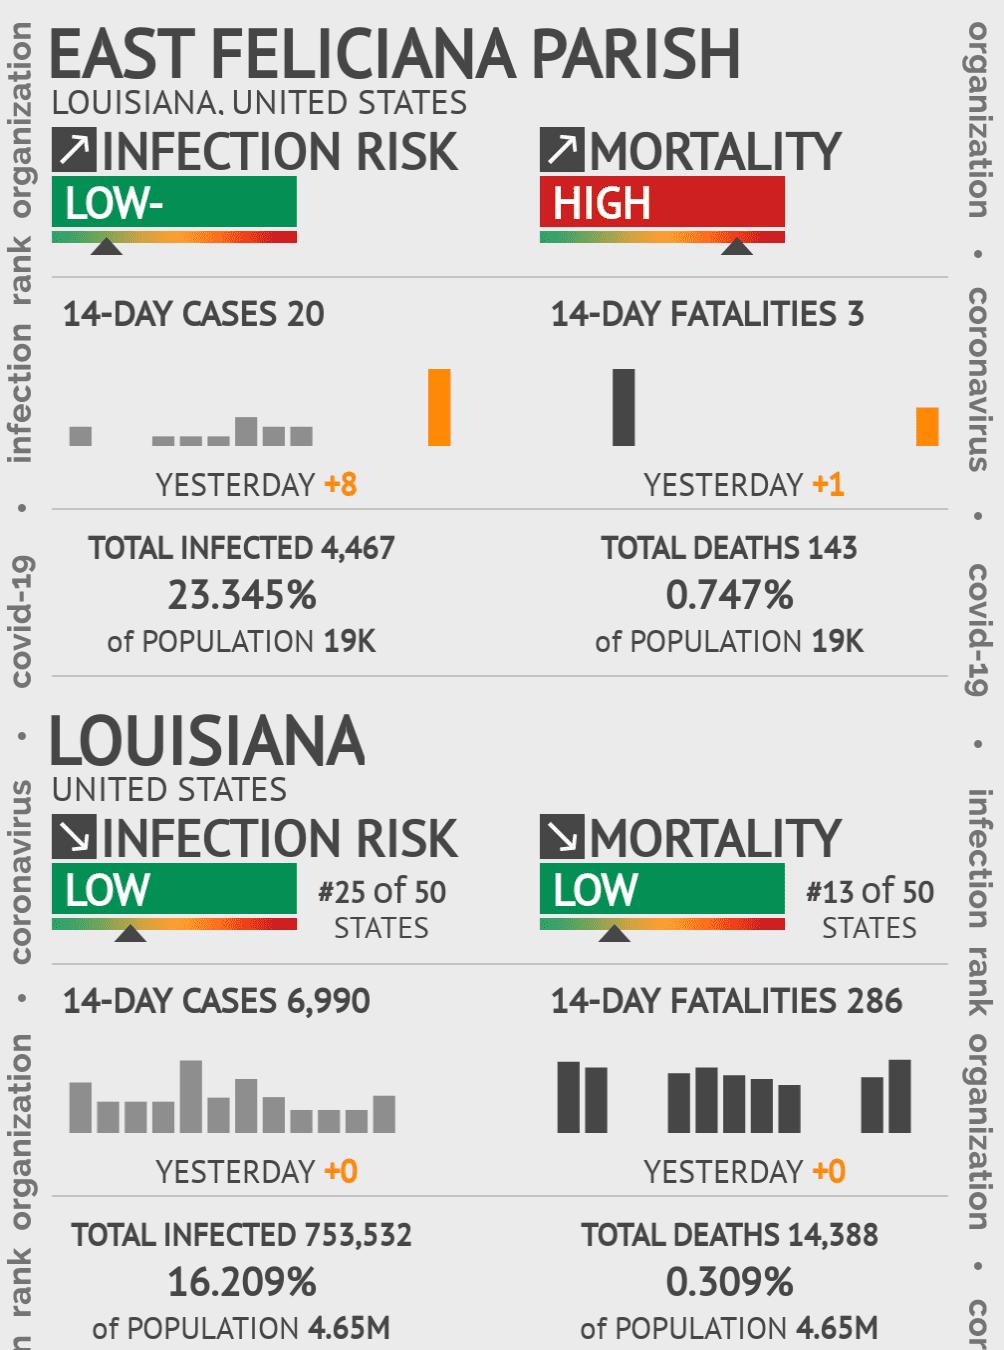 East Feliciana Parish Coronavirus Covid-19 Risk of Infection on March 06, 2021